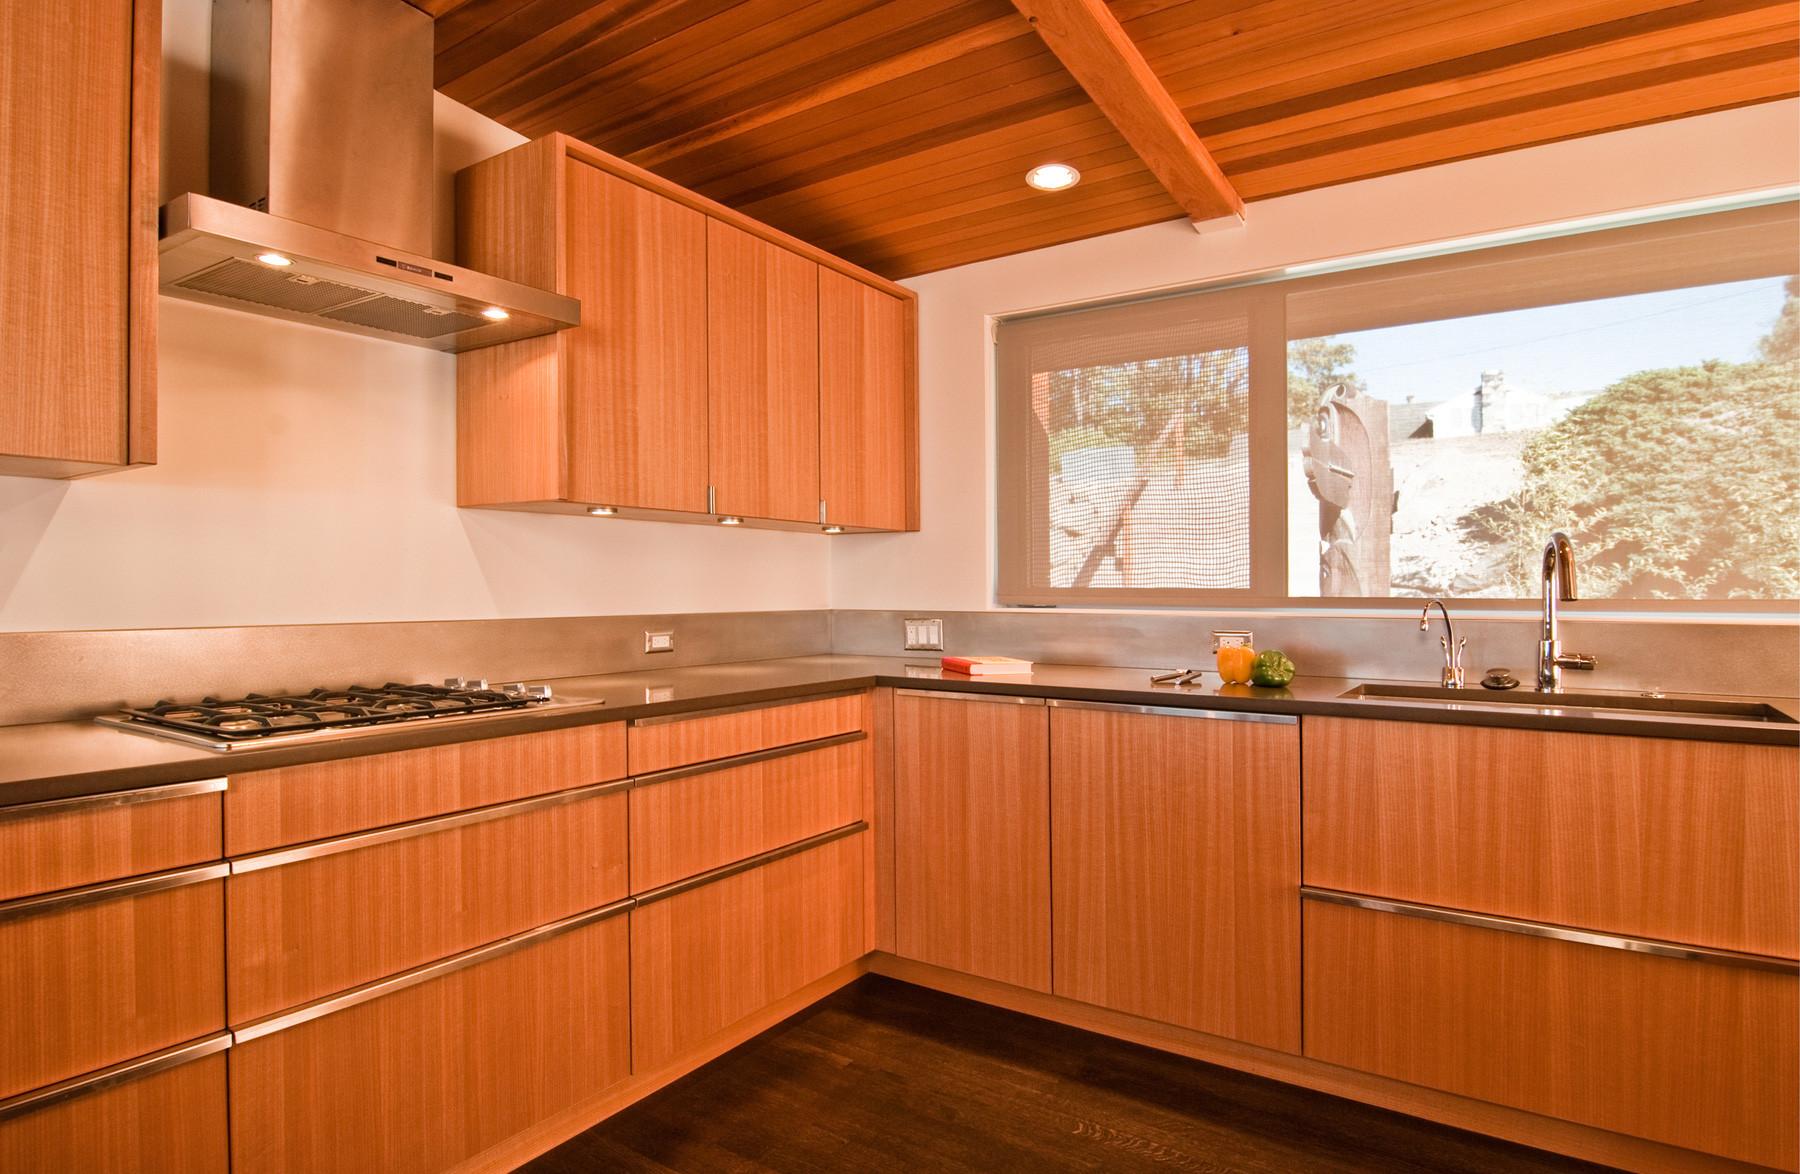 Modern Handles For Kitchen Cabinet  Mid Century Modern Kitchen Cabinets Re mendation – HomesFeed